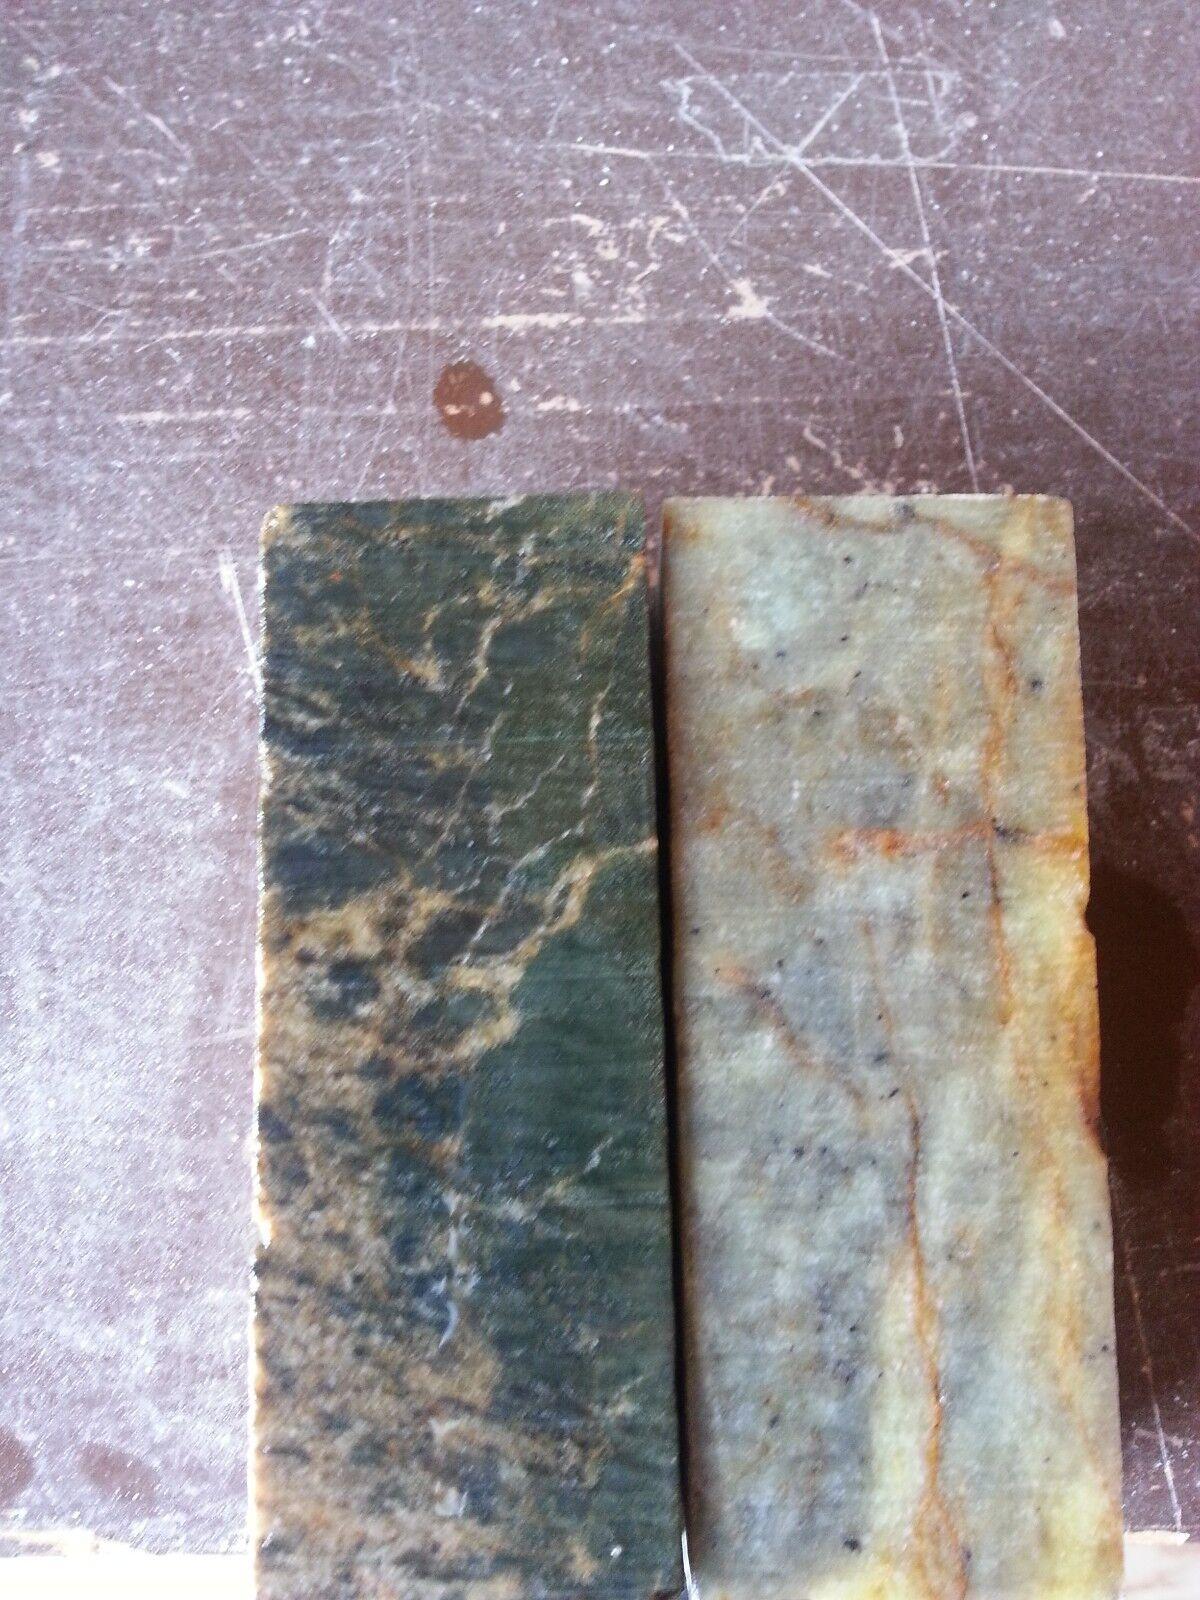 2PCS 4x1-1.5x1-1.5 Soapstone for carving, block, slab, pipe making, pendants